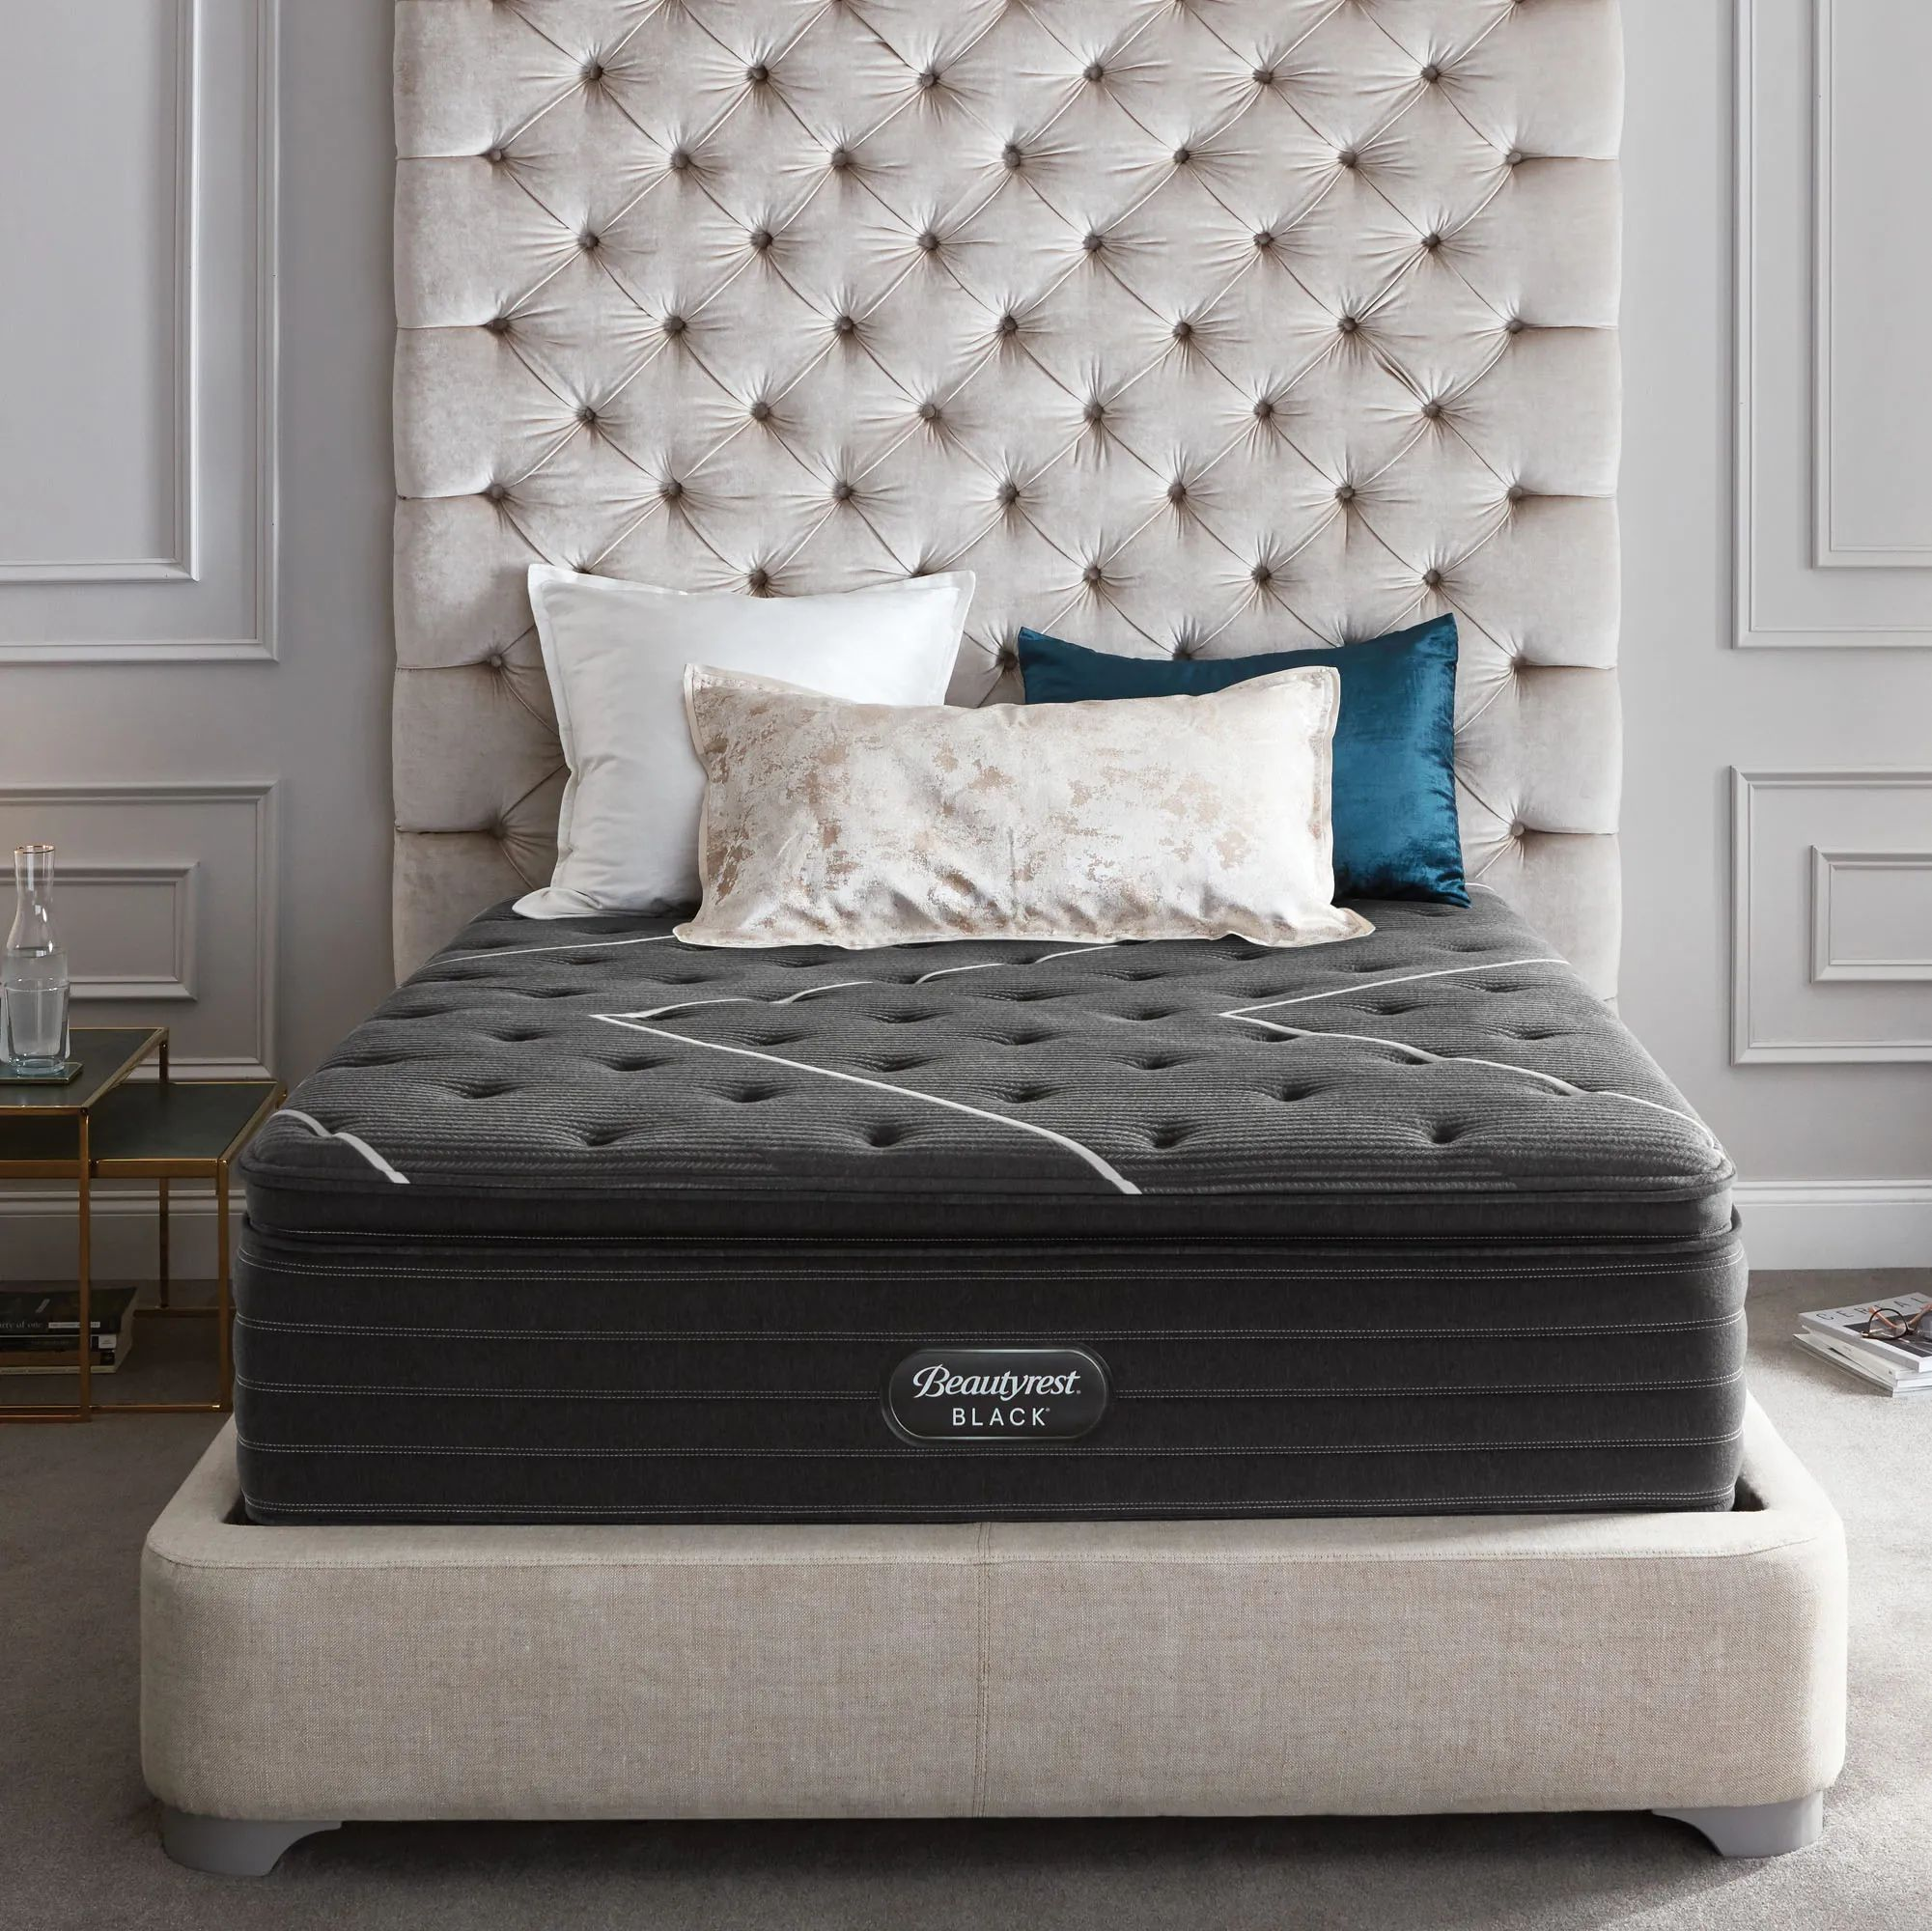 queen simmons beautyrest black natasha ii plush pillow top 16 inch mattress free 300 visa gift card